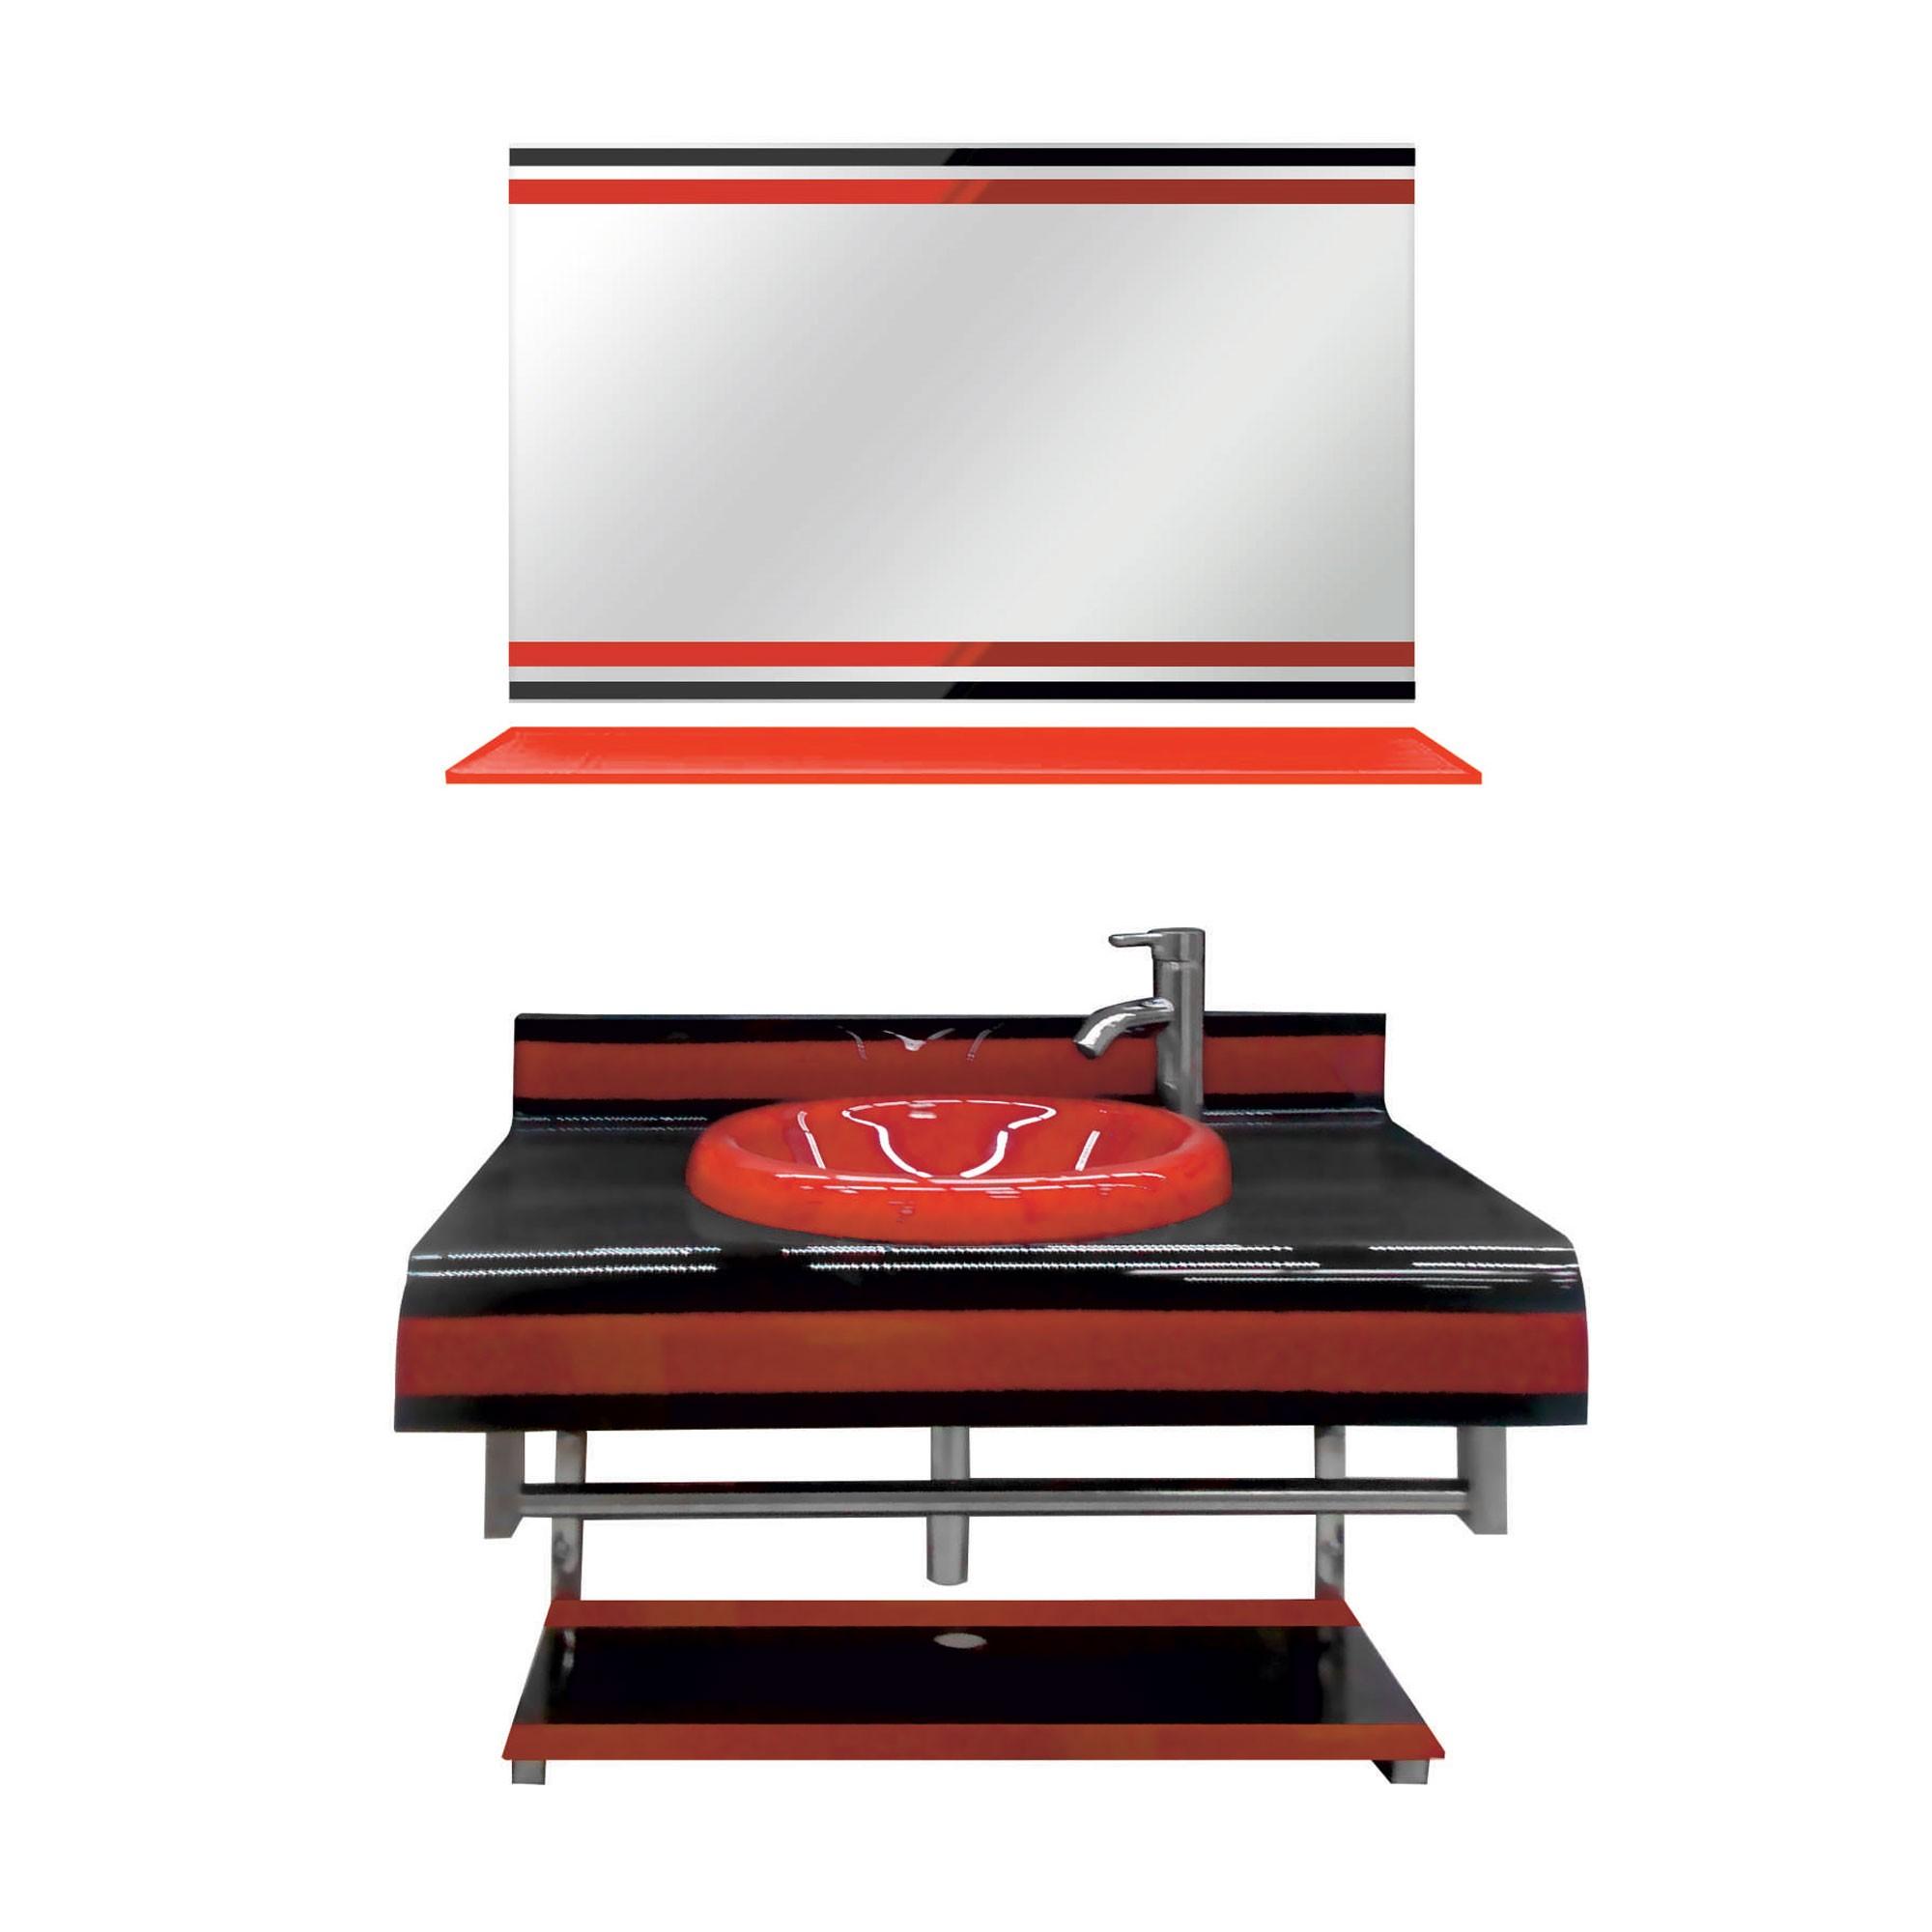 Dedeman Masca baie + lavoar + oglinda 1181, rosu, montaj suspendat